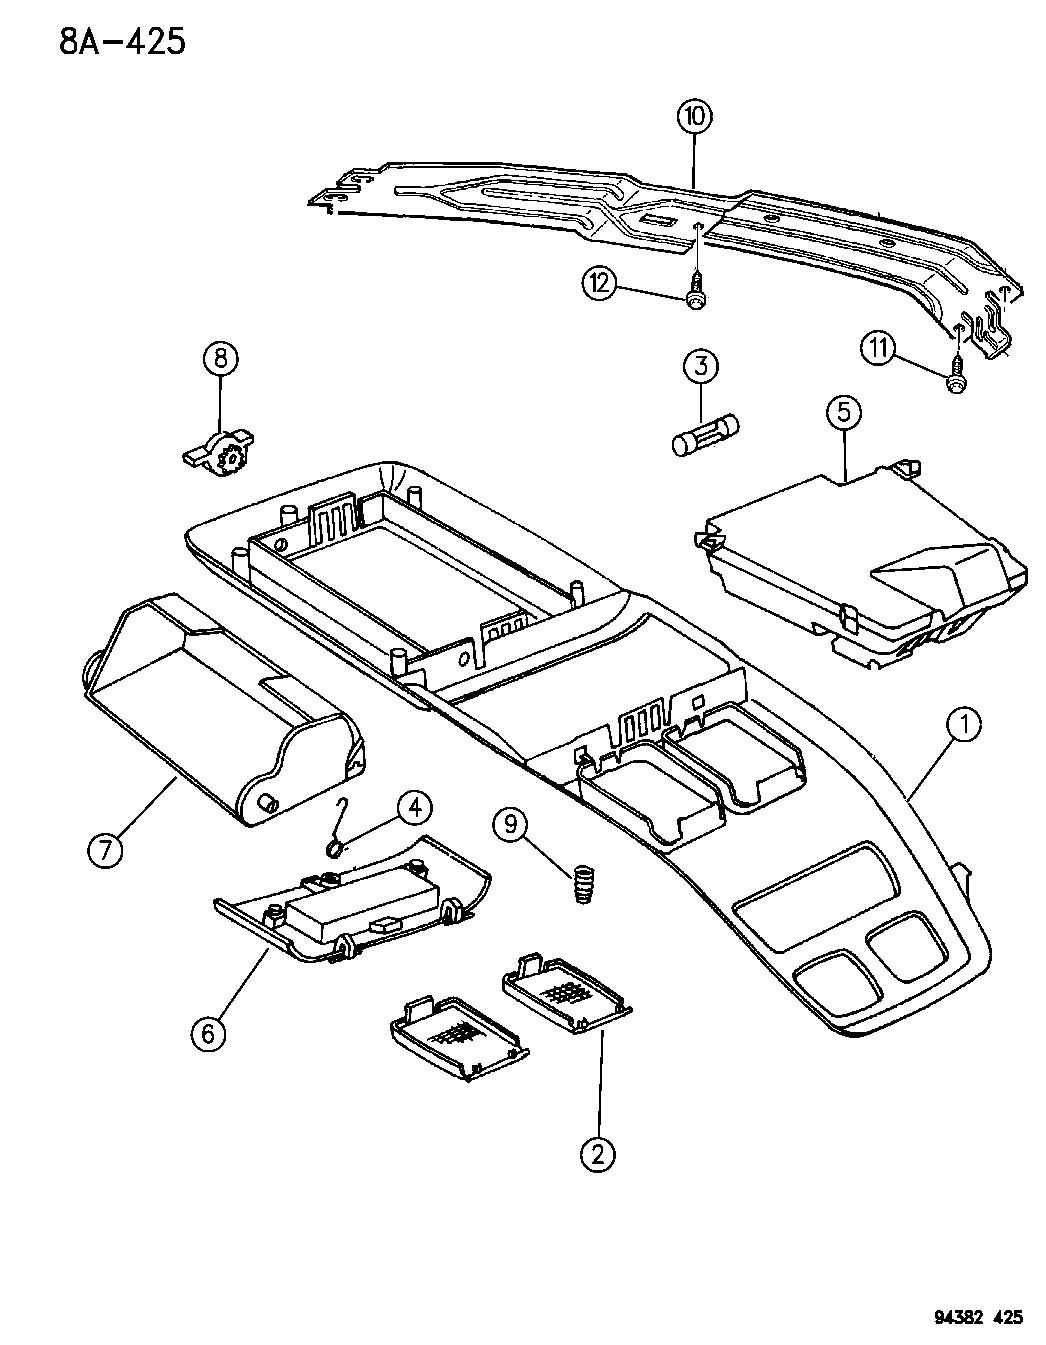 1994 Dodge Dakota OVERHEAD CONSOLE N-BODY